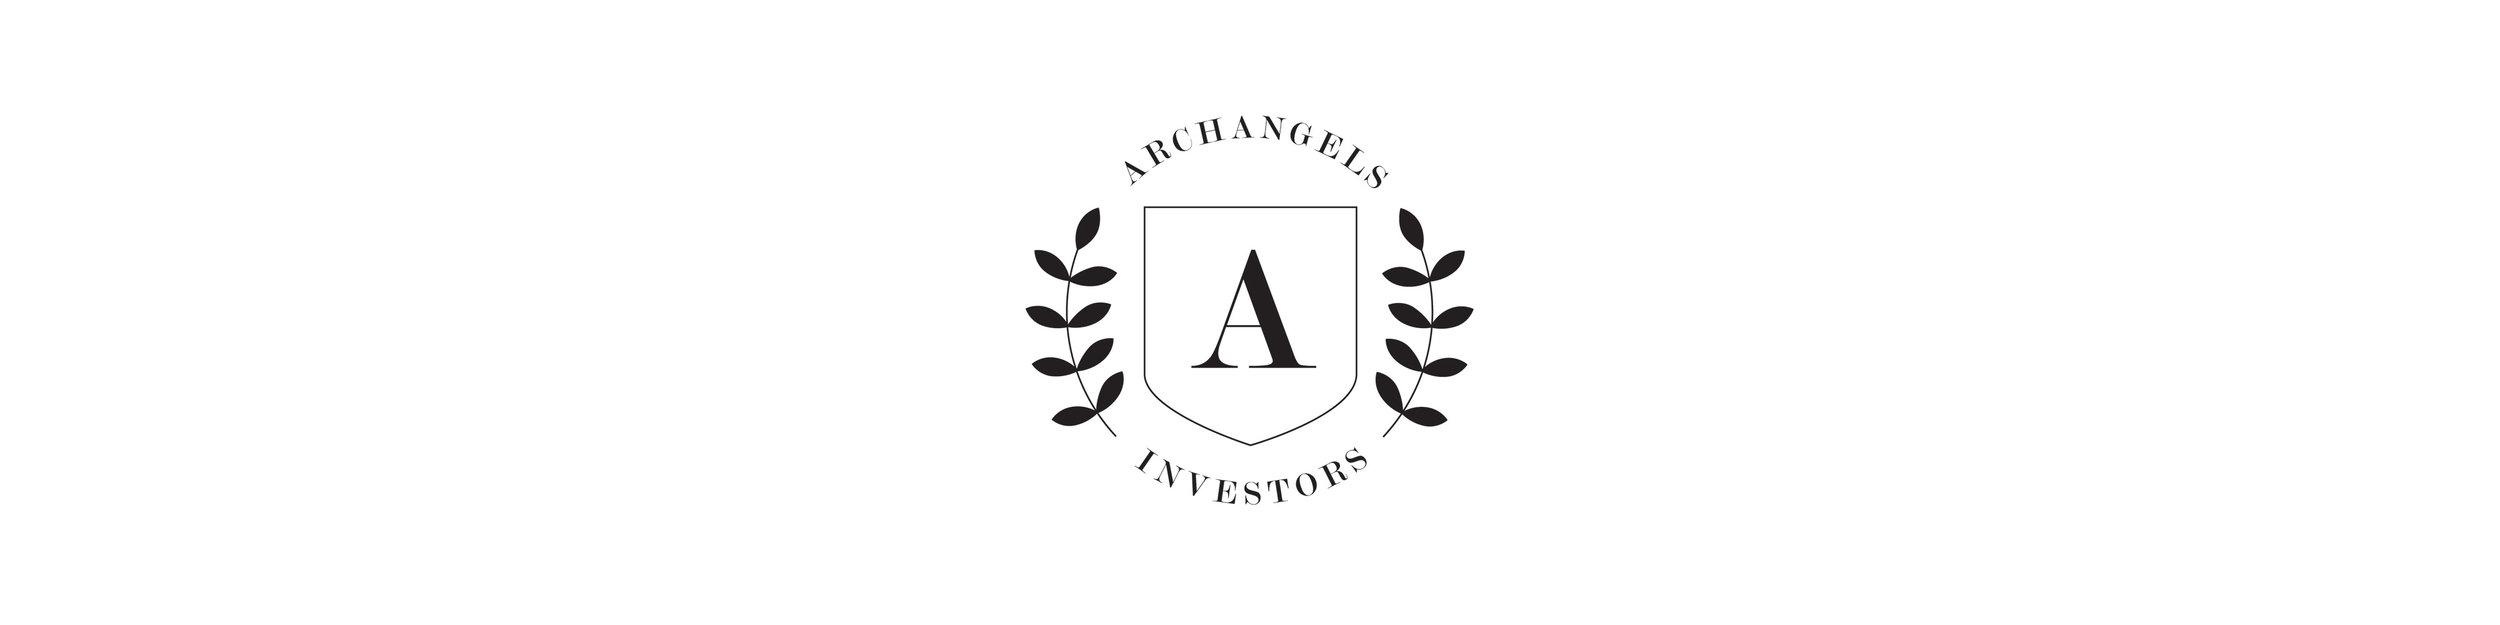 Archangels-1.jpg